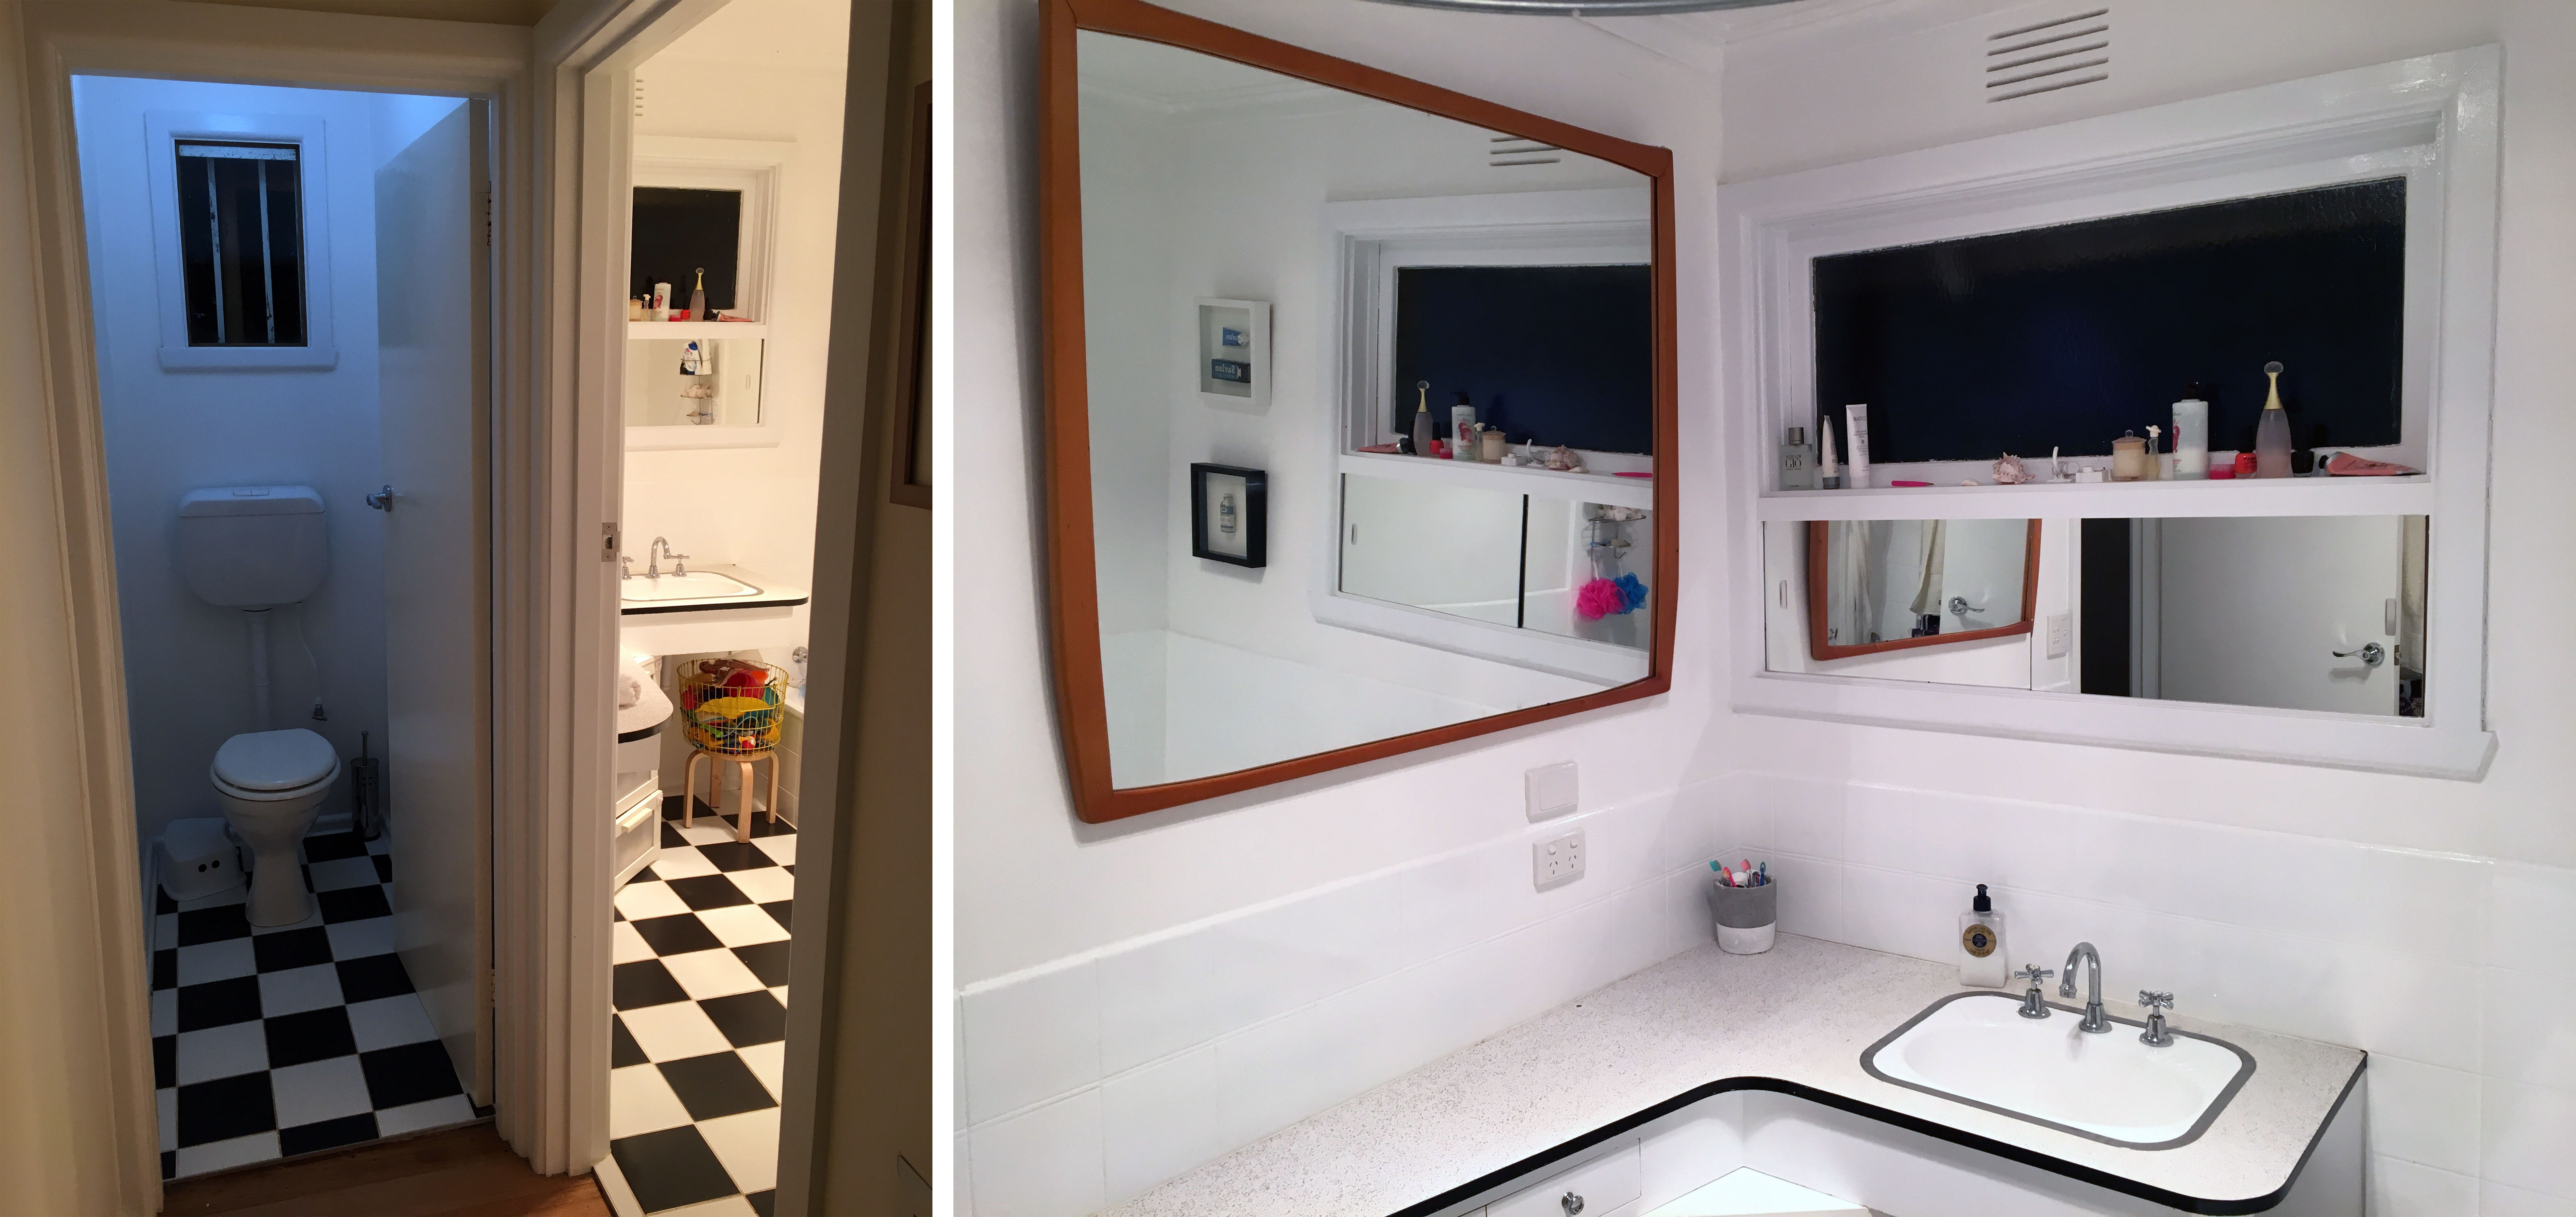 A picture of a bathroom - Budget Reno 2_web Jpg